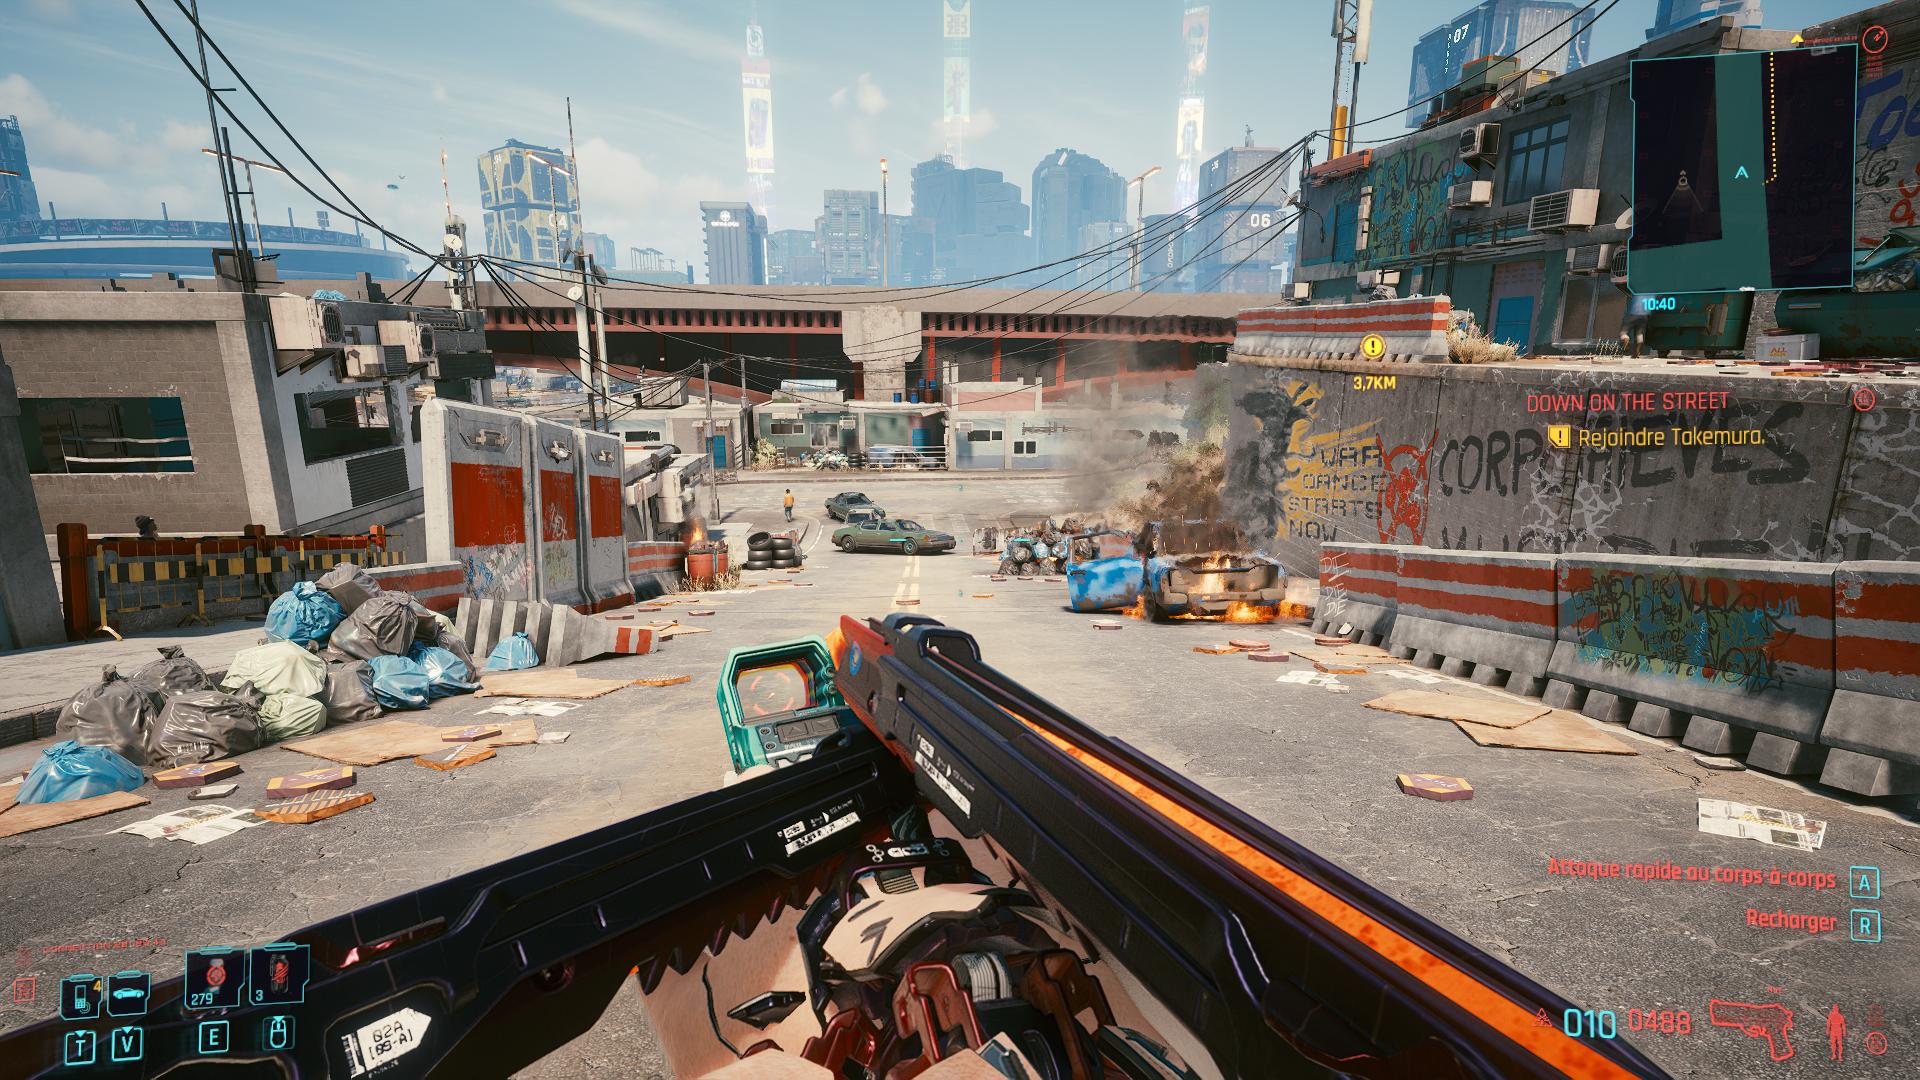 Cyberpunk 2077 Screenshot 2020.12.25 - 20.17.39.20.png